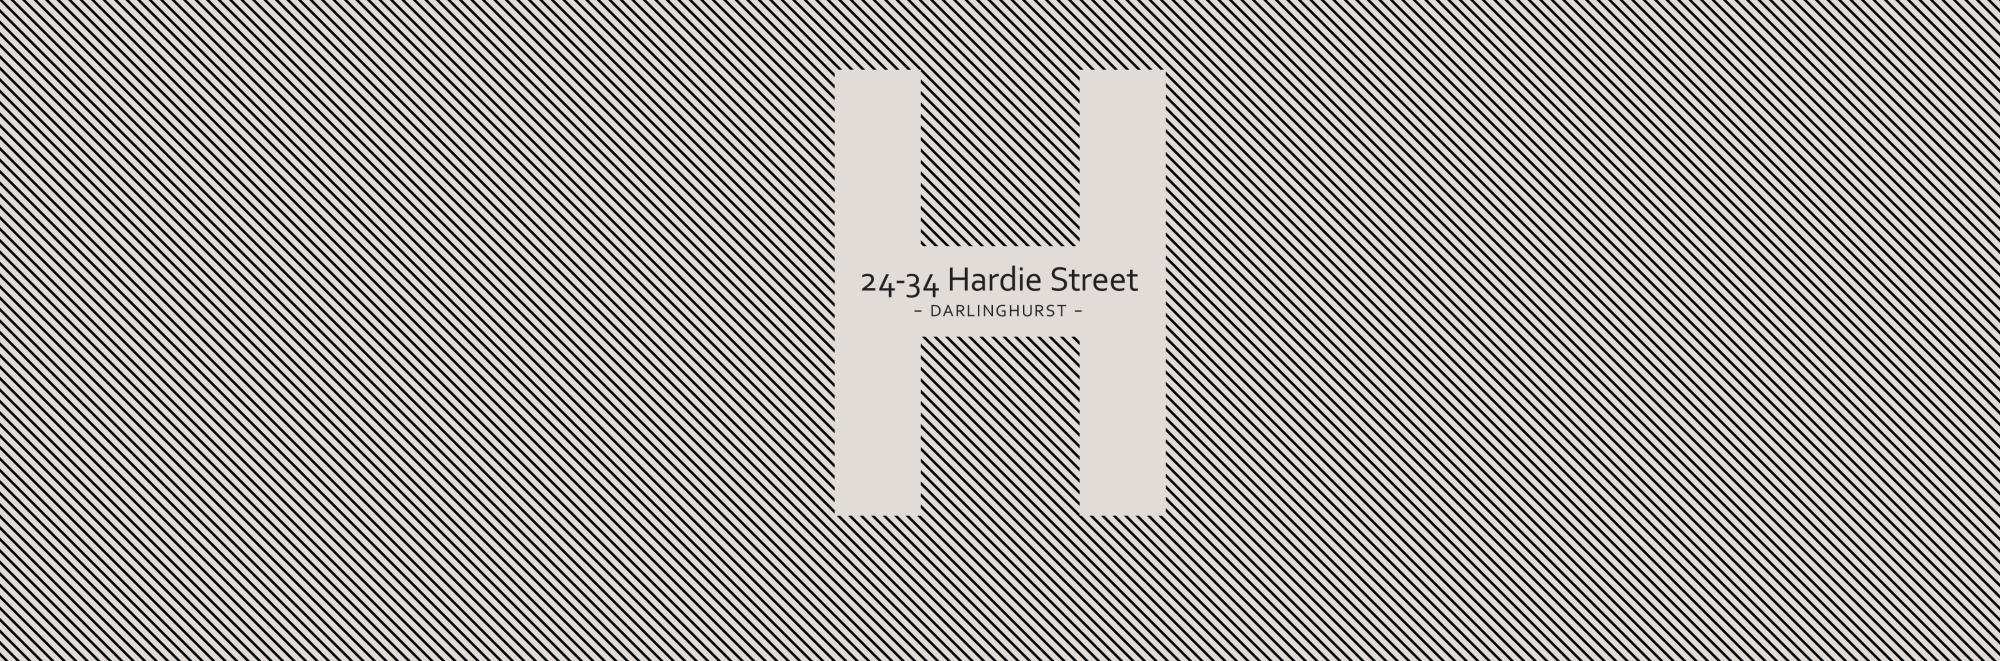 24-34 Harde Street Darlinghurst